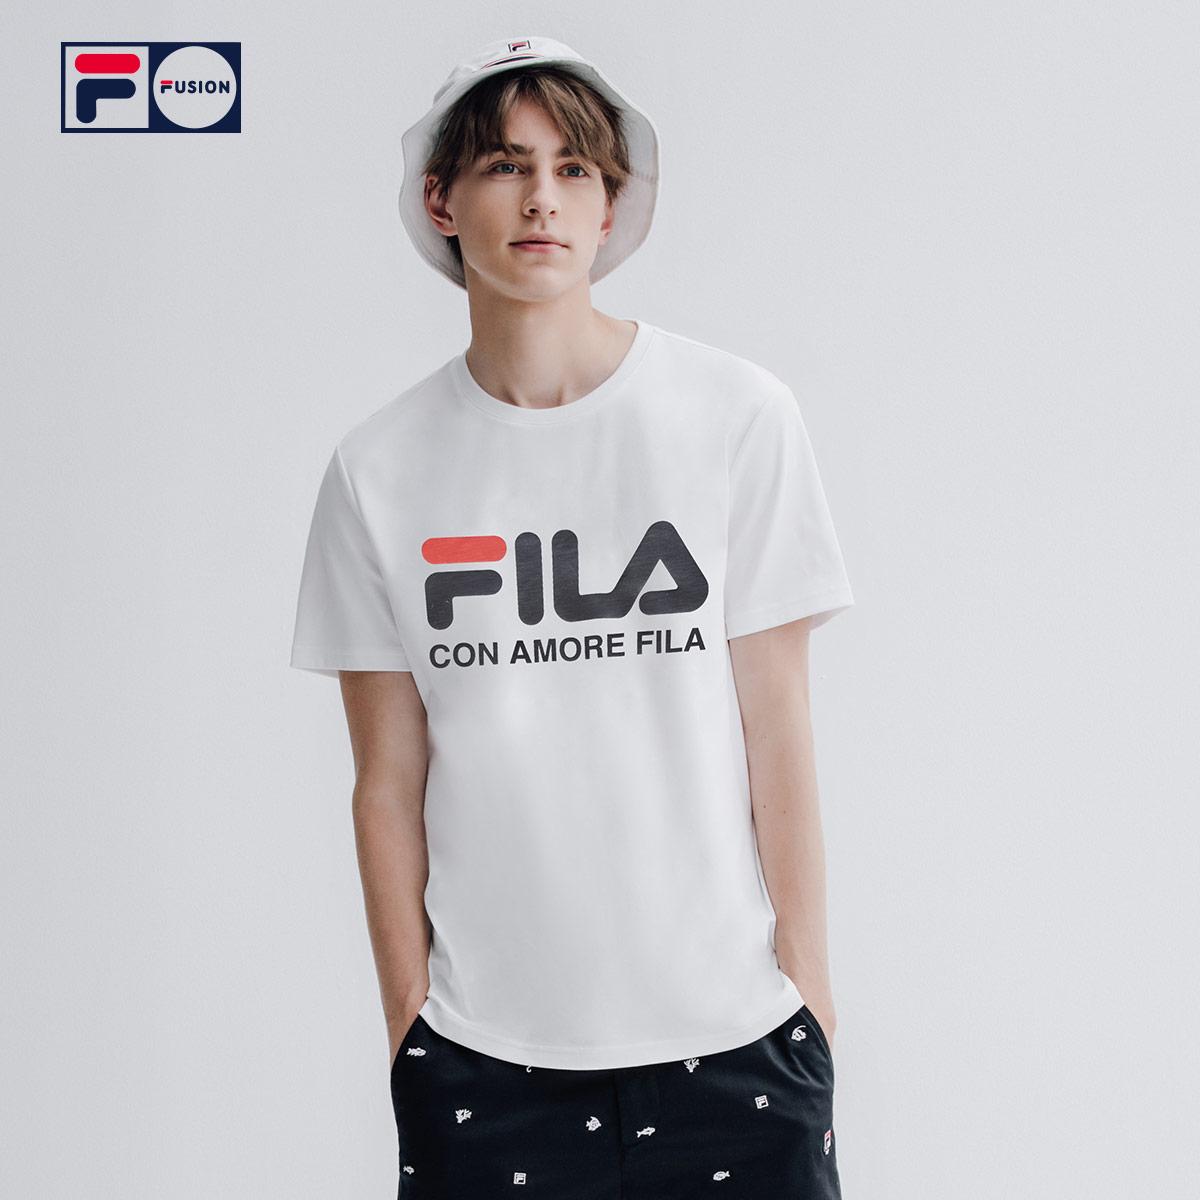 FILA FUSION 斐乐 男子短袖T恤 2020春季透气休闲运动圆领百搭短T